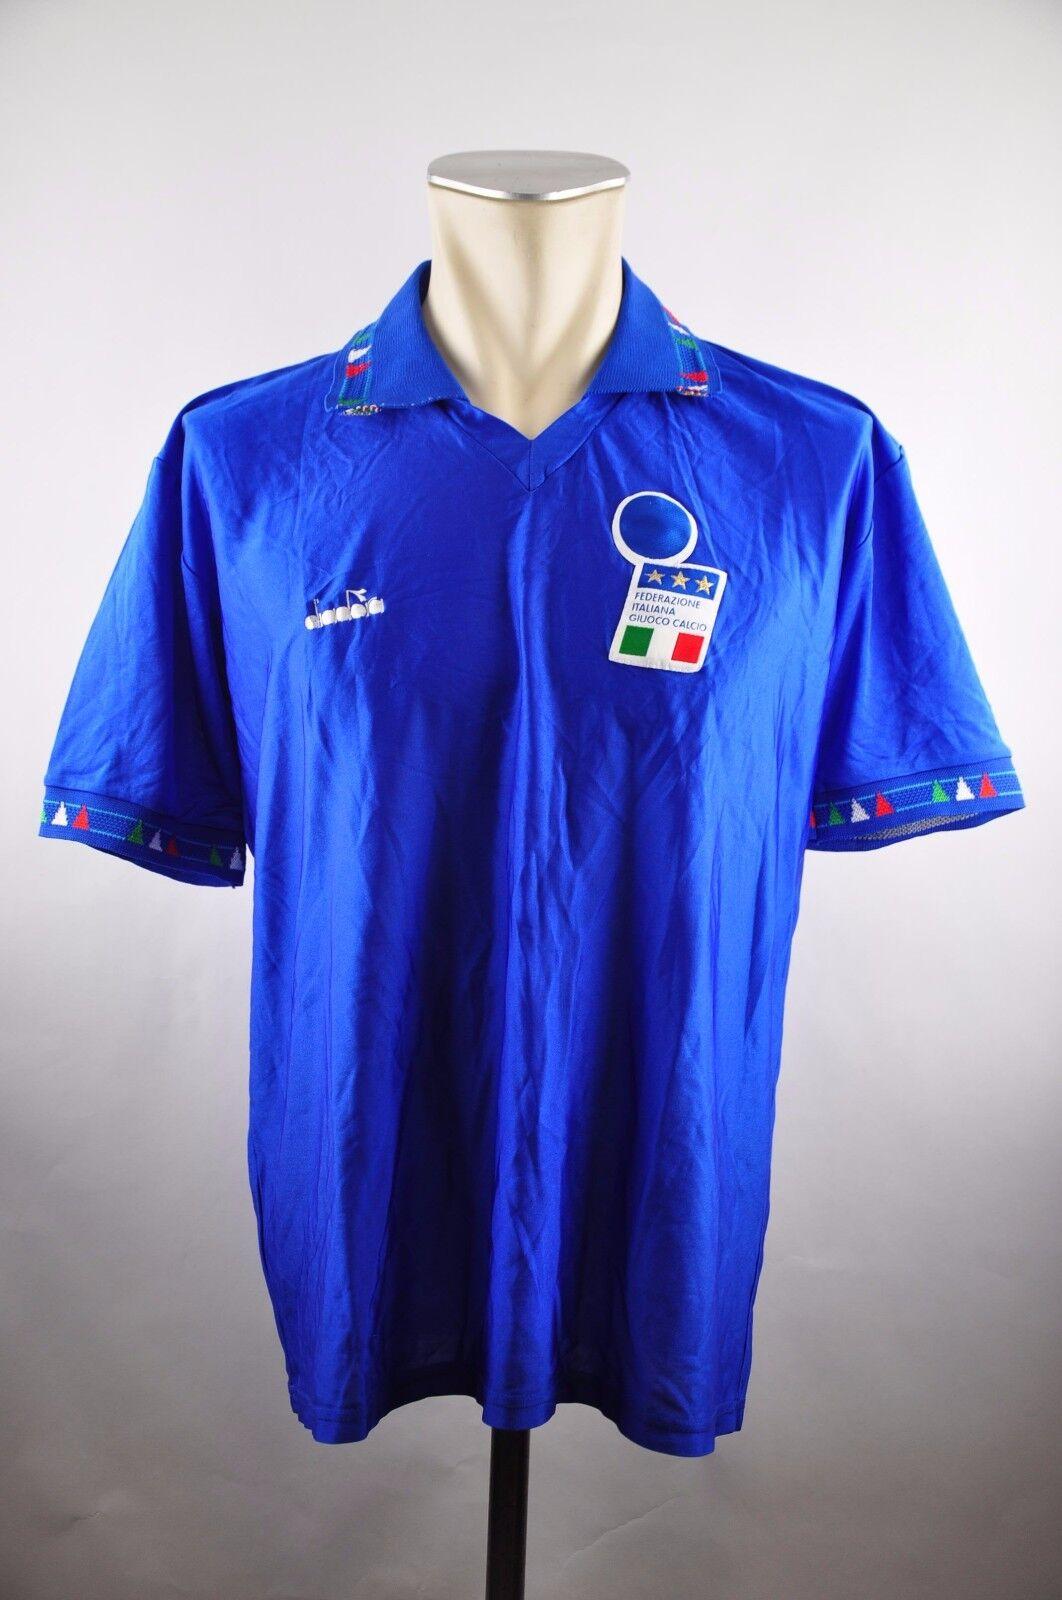 Italien Trikot 1992 Gr. XL vintage vintage vintage Jersey EM Home blau  maglia Diadora WM 63f051